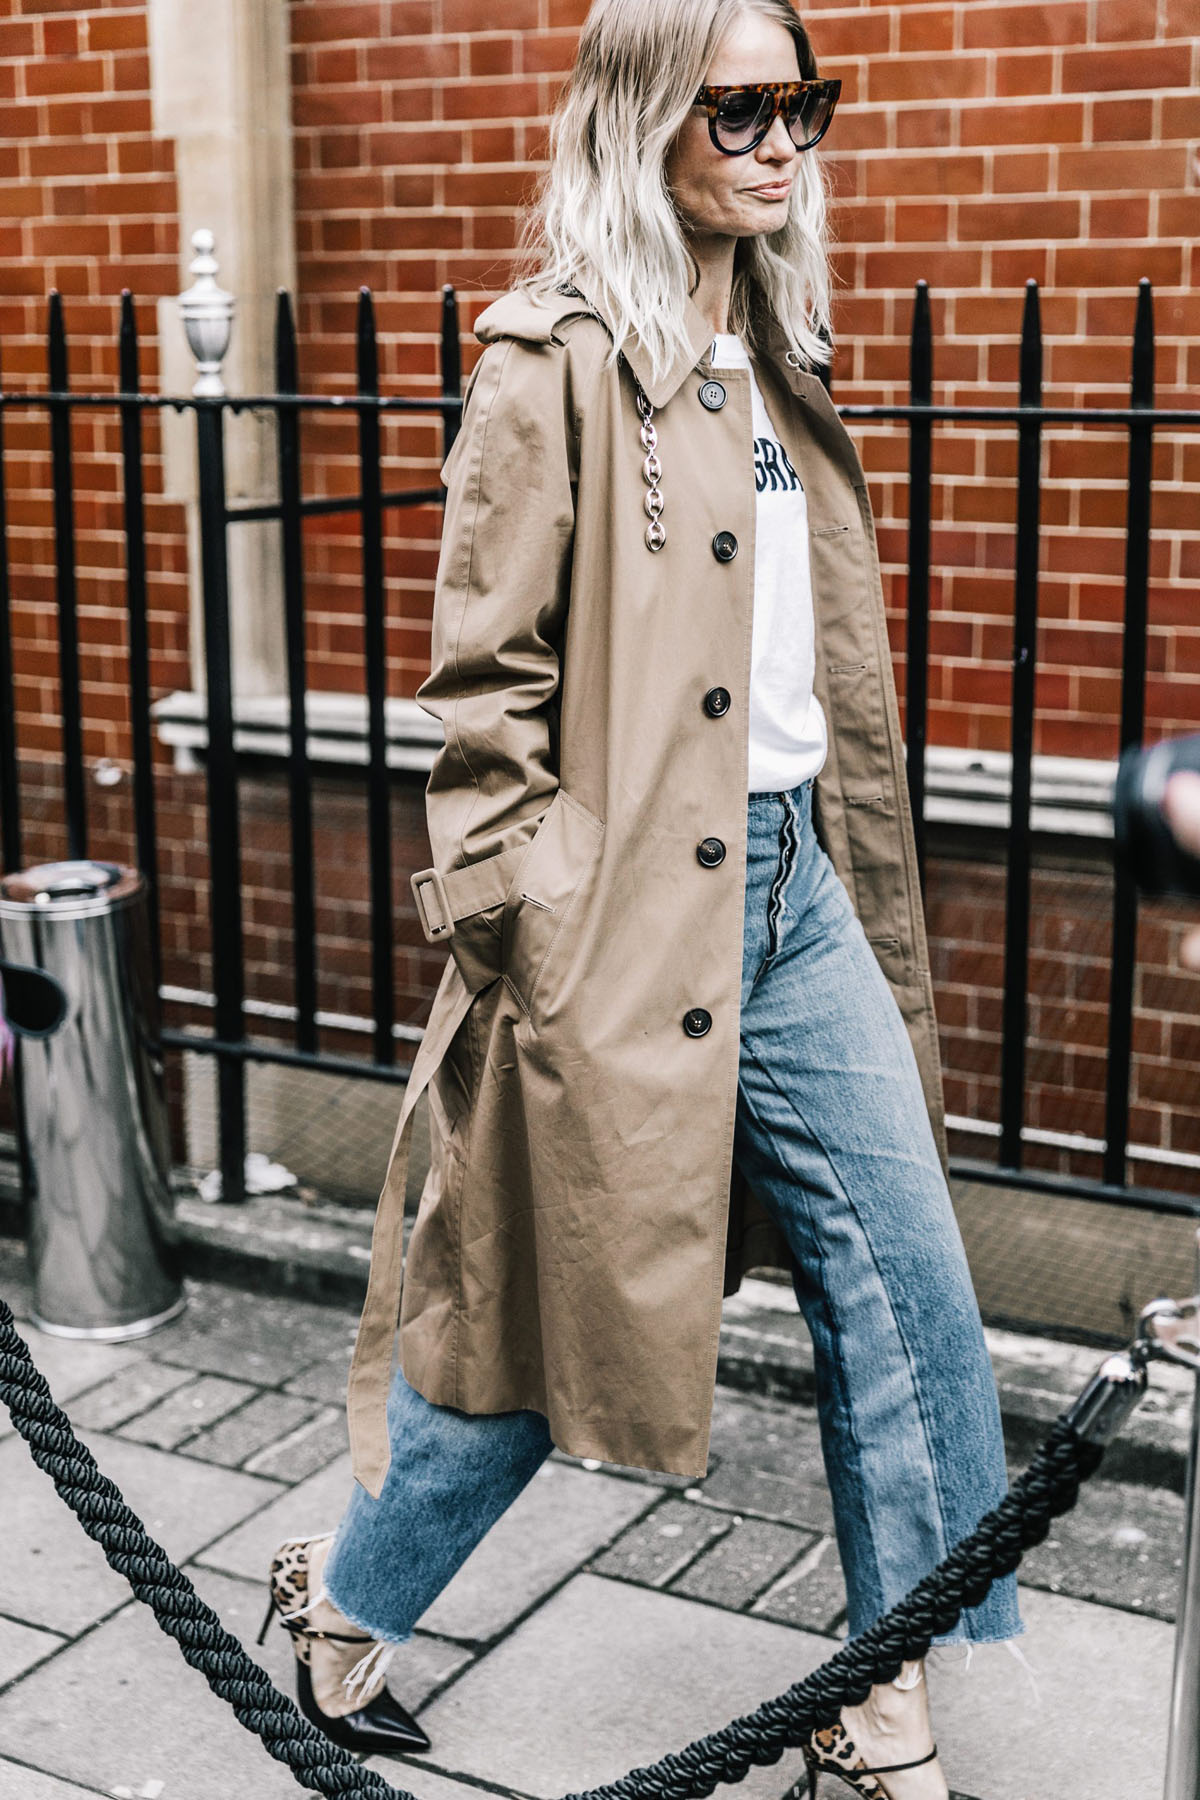 London_Fashion_Week_Fall_2017-LFW-JW_Anderson-Julien_Macdonald-Ports1961-Street_Style-184-1800x2700